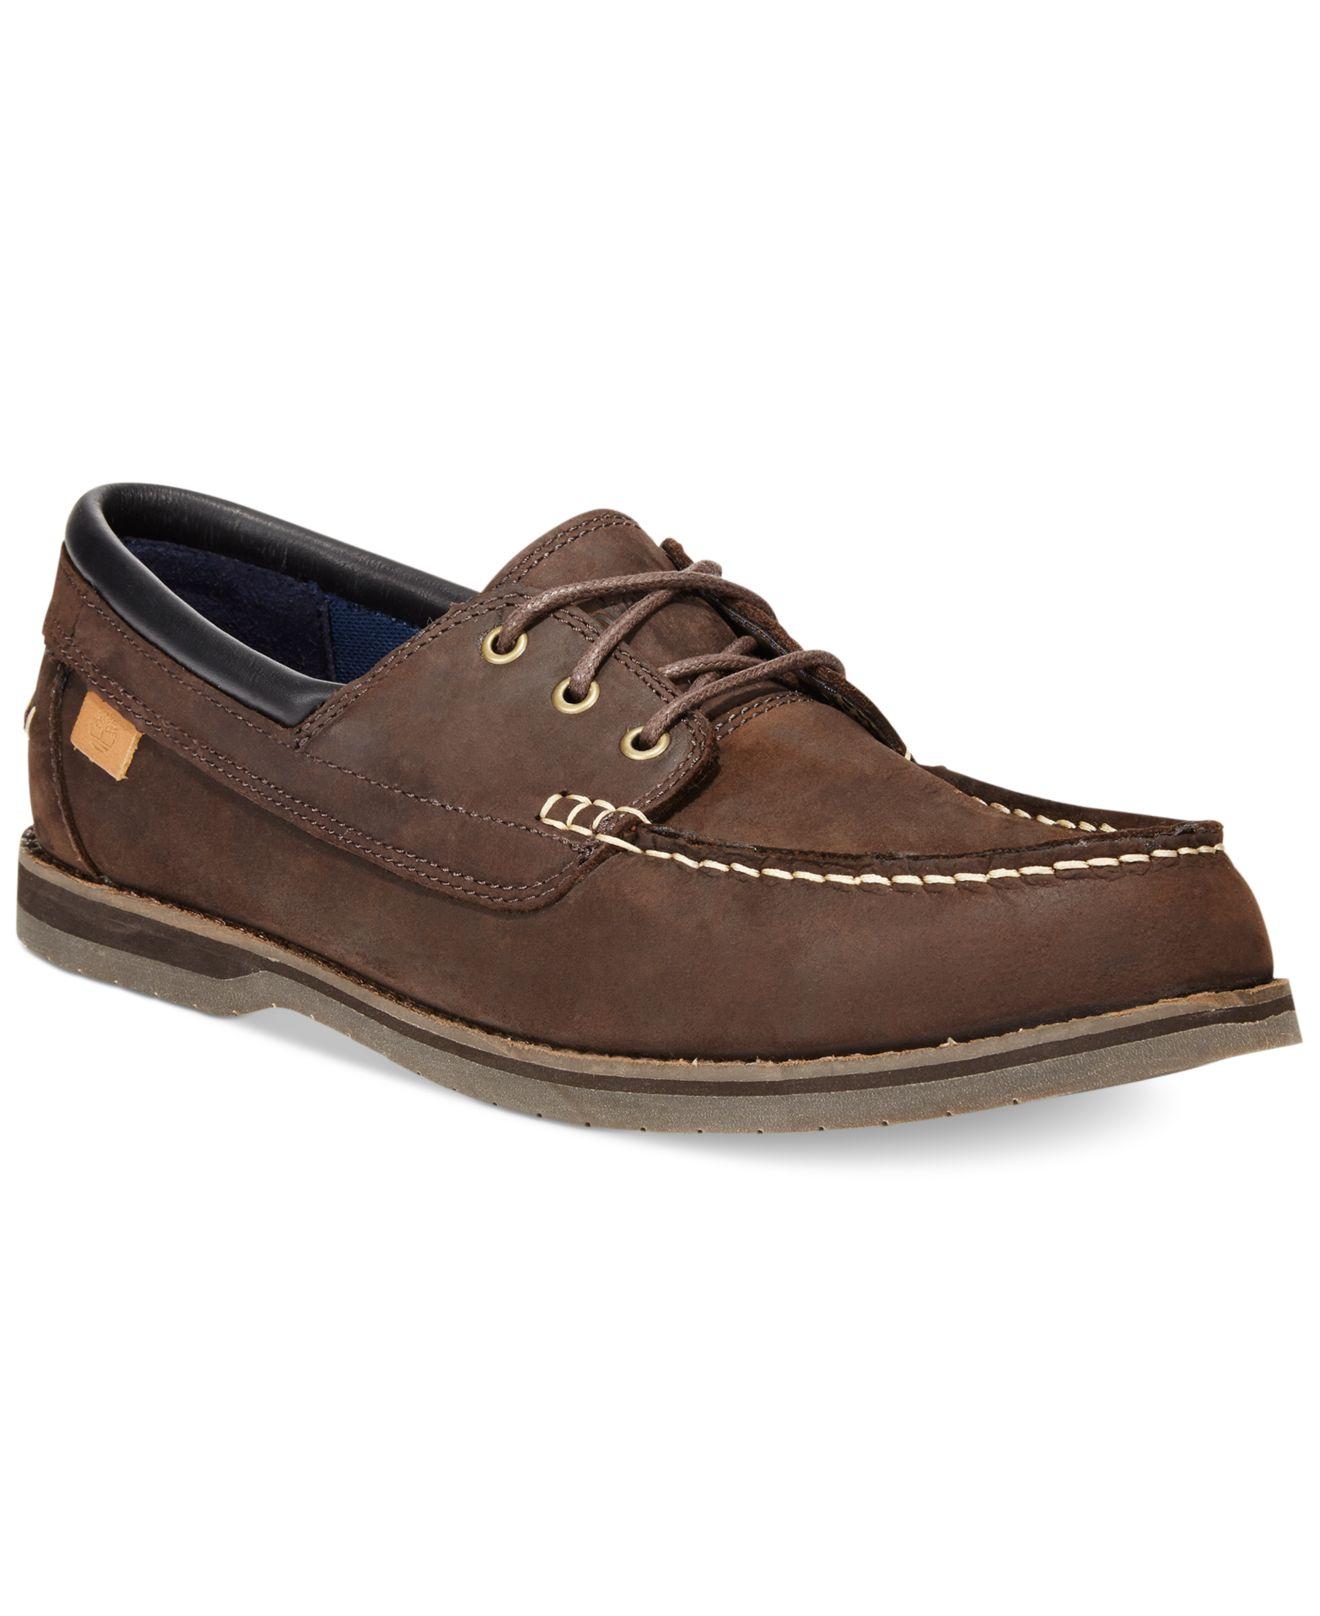 timberland men 39 s bluffton boat shoes in brown for men lyst. Black Bedroom Furniture Sets. Home Design Ideas